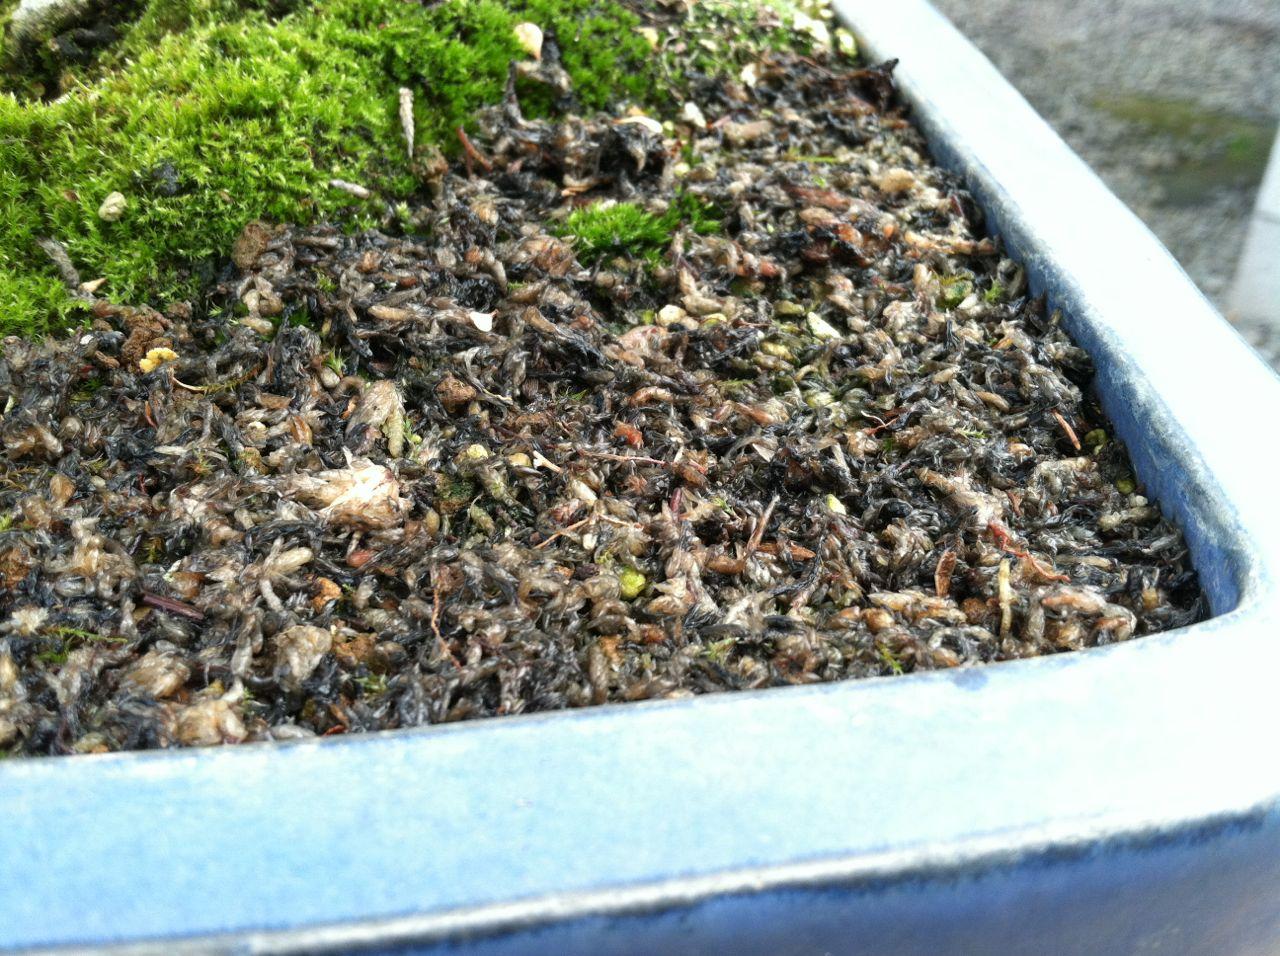 The Moss Myth Michael Hagedorn